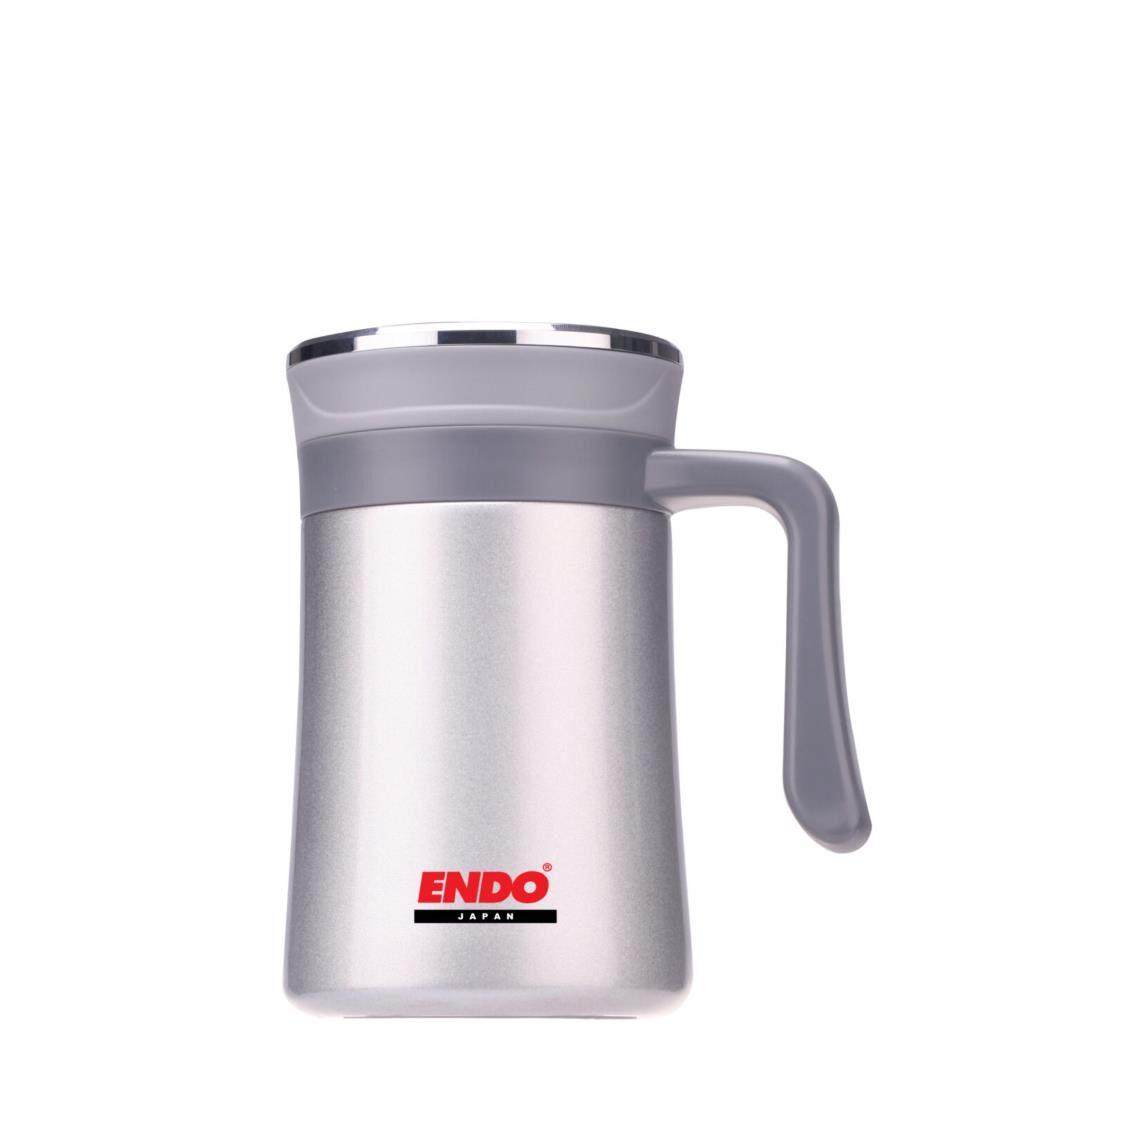 Endo 500ml Anti-bac Double Ssteel Vacuumised Desk Mug CX1008